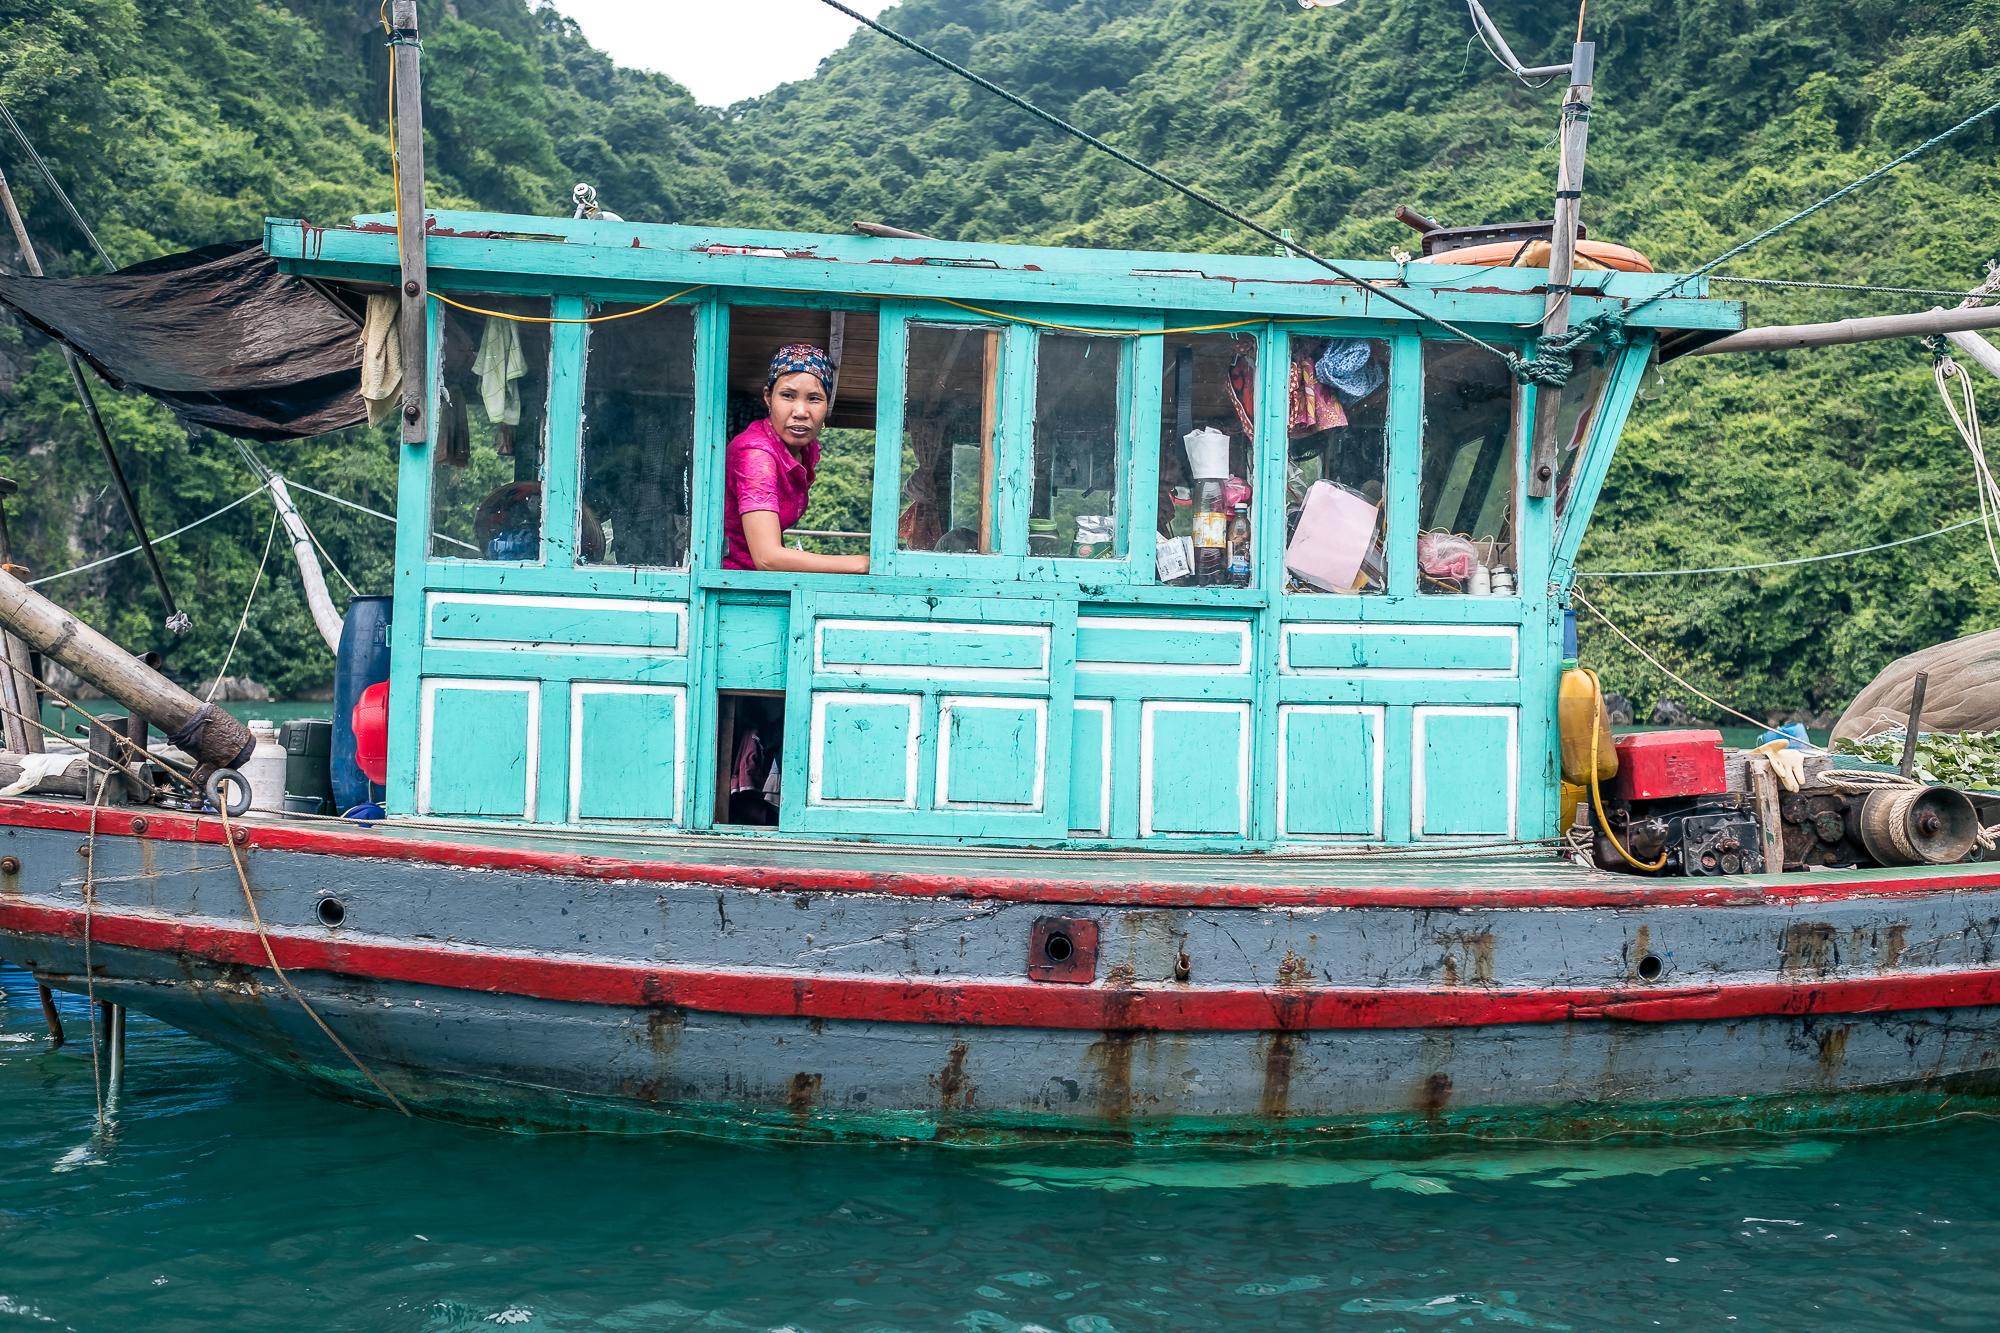 Vietnam_Honeymoon_TheOutsiderBlog_DSCF8427.JPG